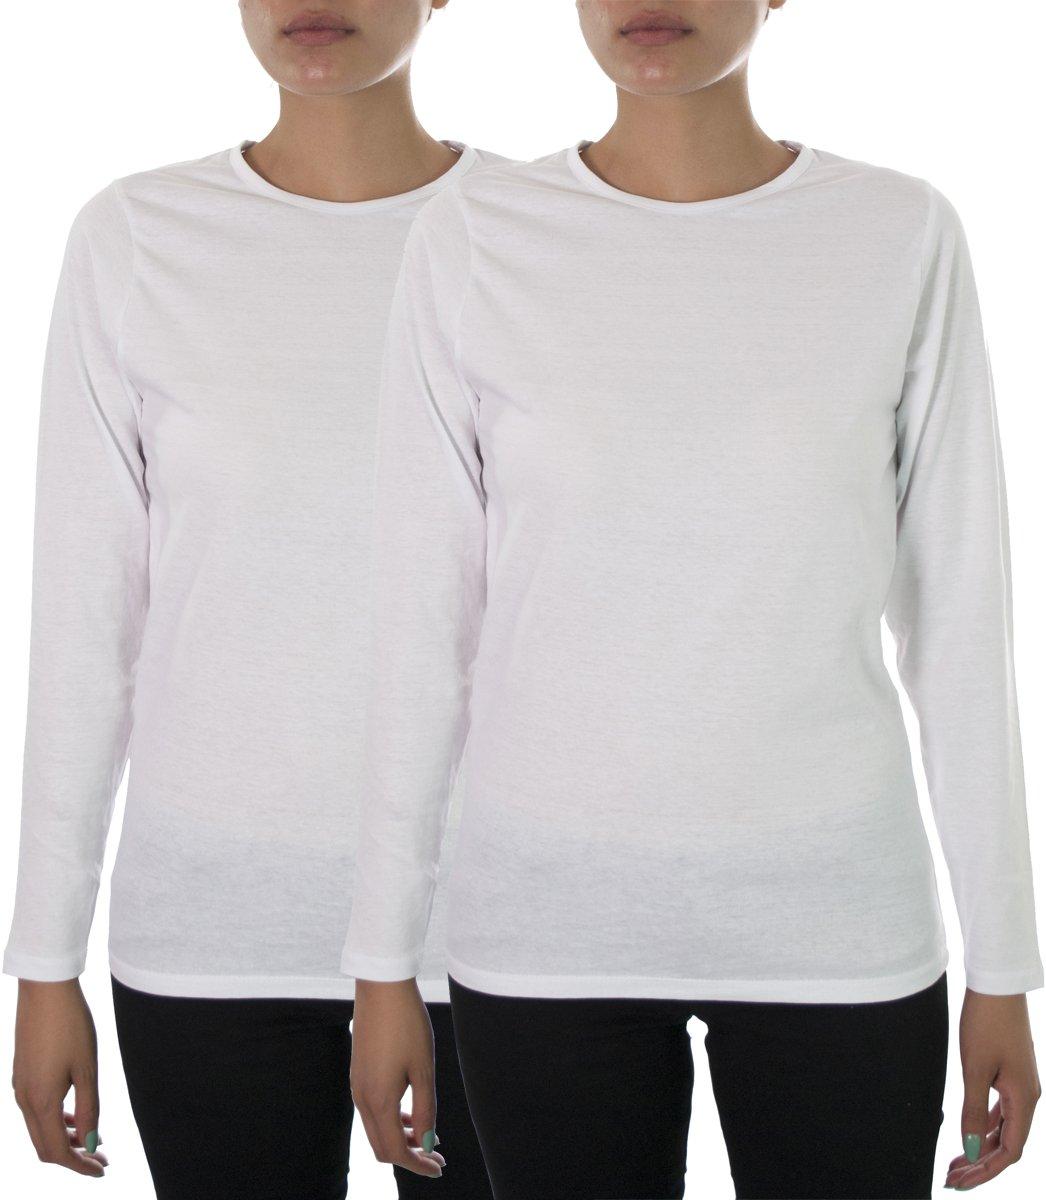 Hey Medical Uniforms SHIRT レディース B076Z2BNZM L|2 Pack White 2 Pack White L